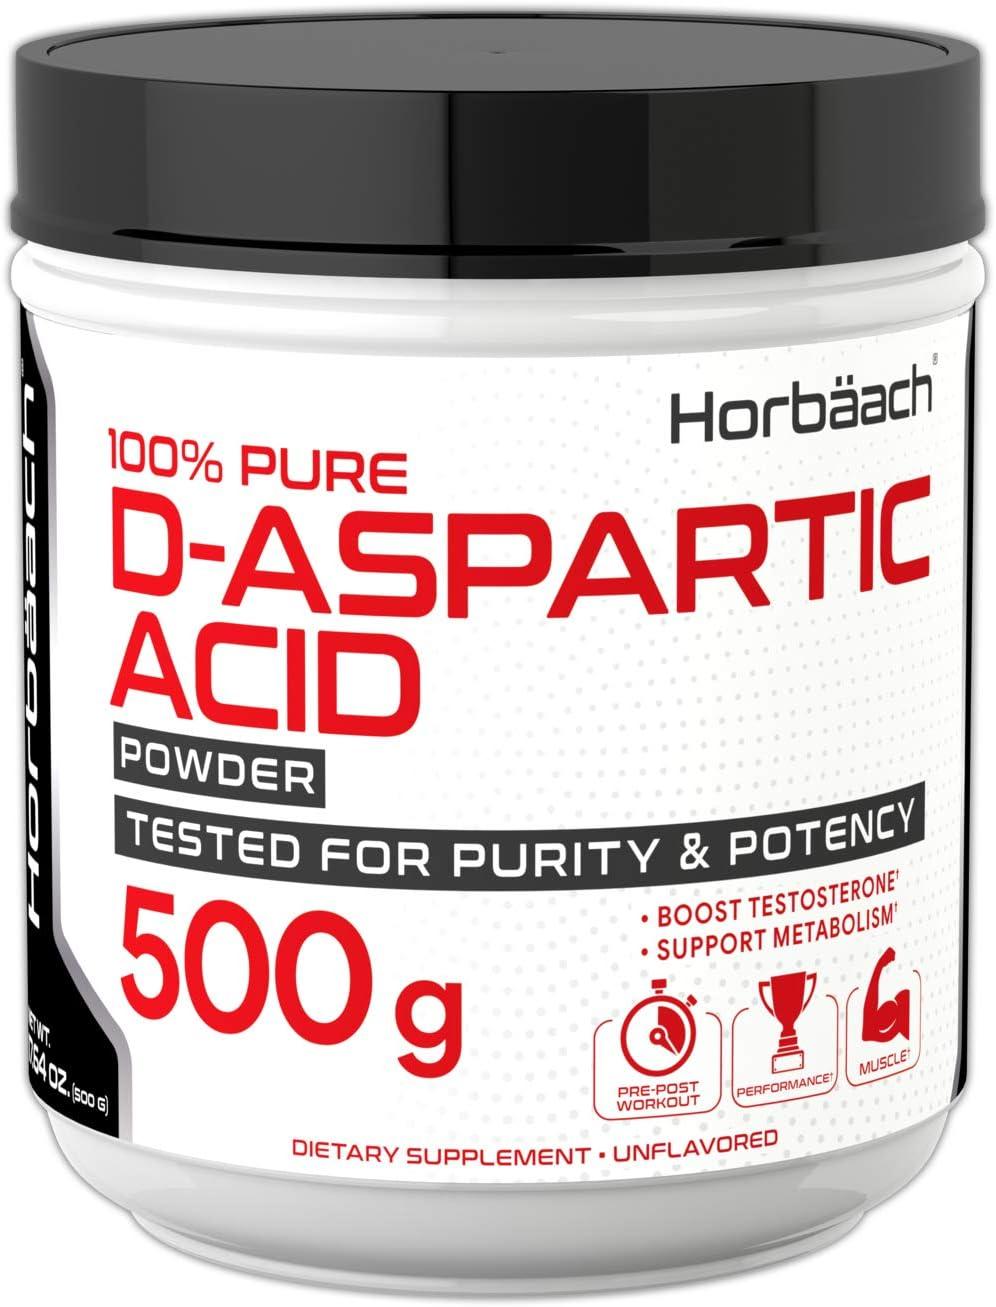 Horbaach D-Aspartic Acid Powder 500 Grams | DAA Testosterone Booster Supplement